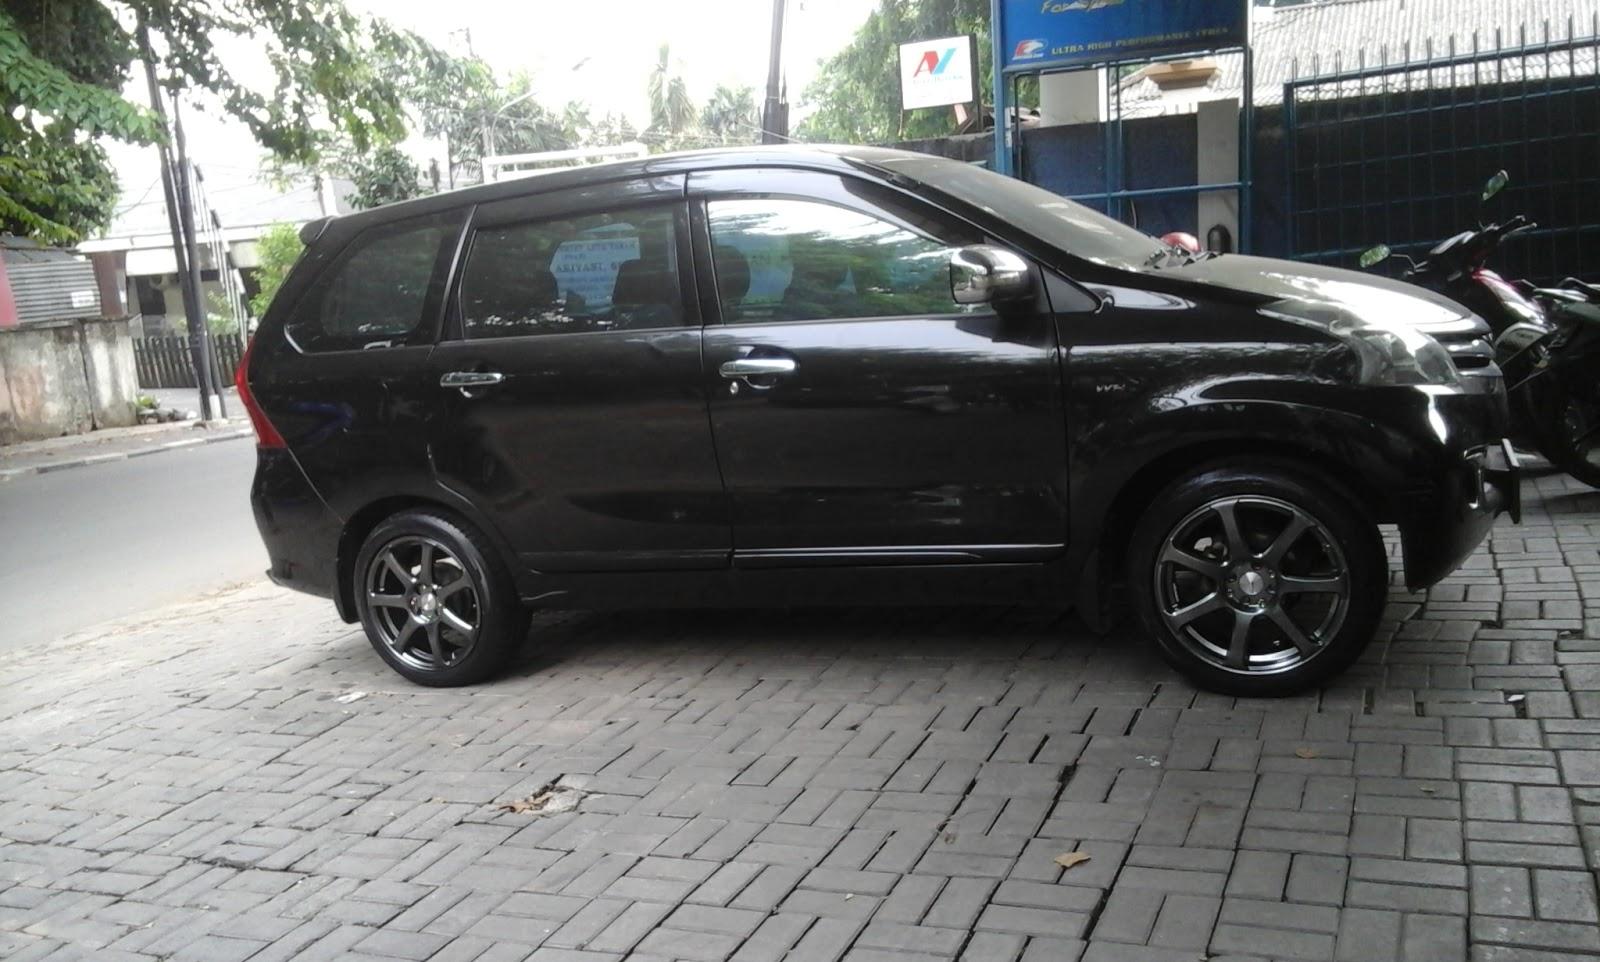 Ban Grand New Veloz Harga All Kijang Innova Bekas Top Modifikasi Mobil Avanza Sobat 92 2017